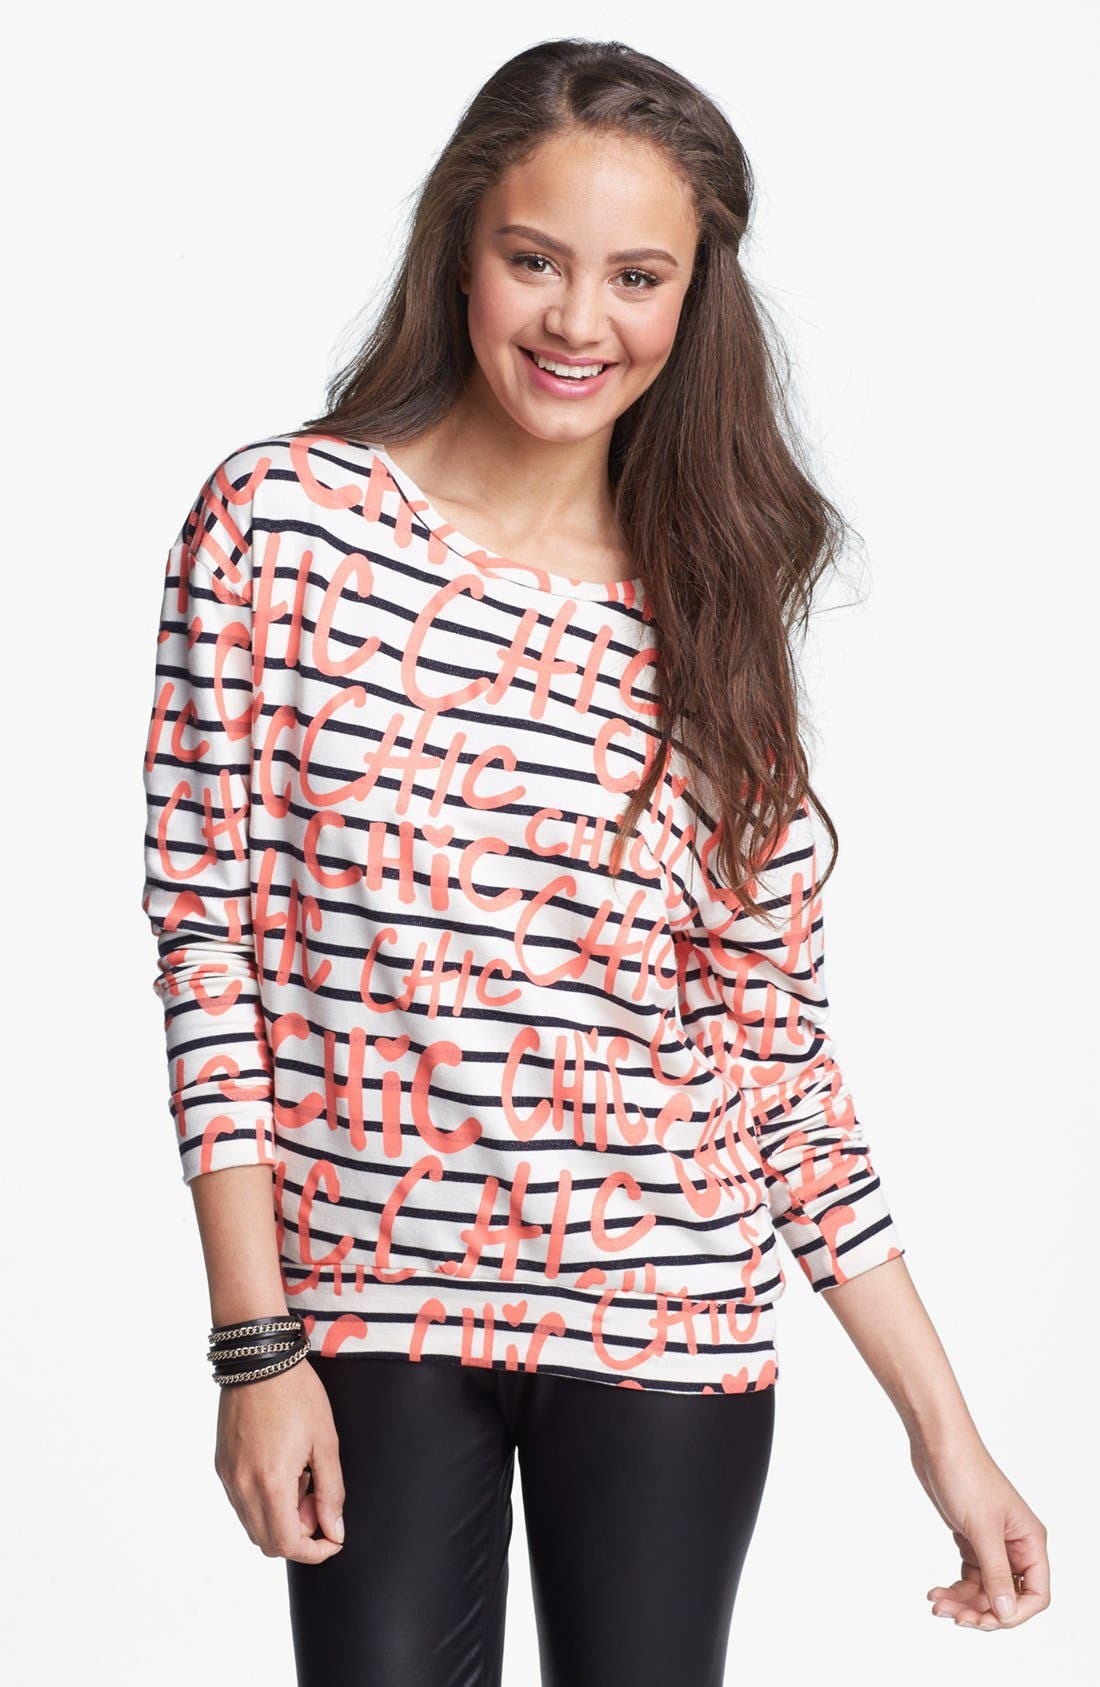 Alternate Image 1 Selected - Ten Sixty Sherman 'Chic' Stripe Sweatshirt (Juniors)